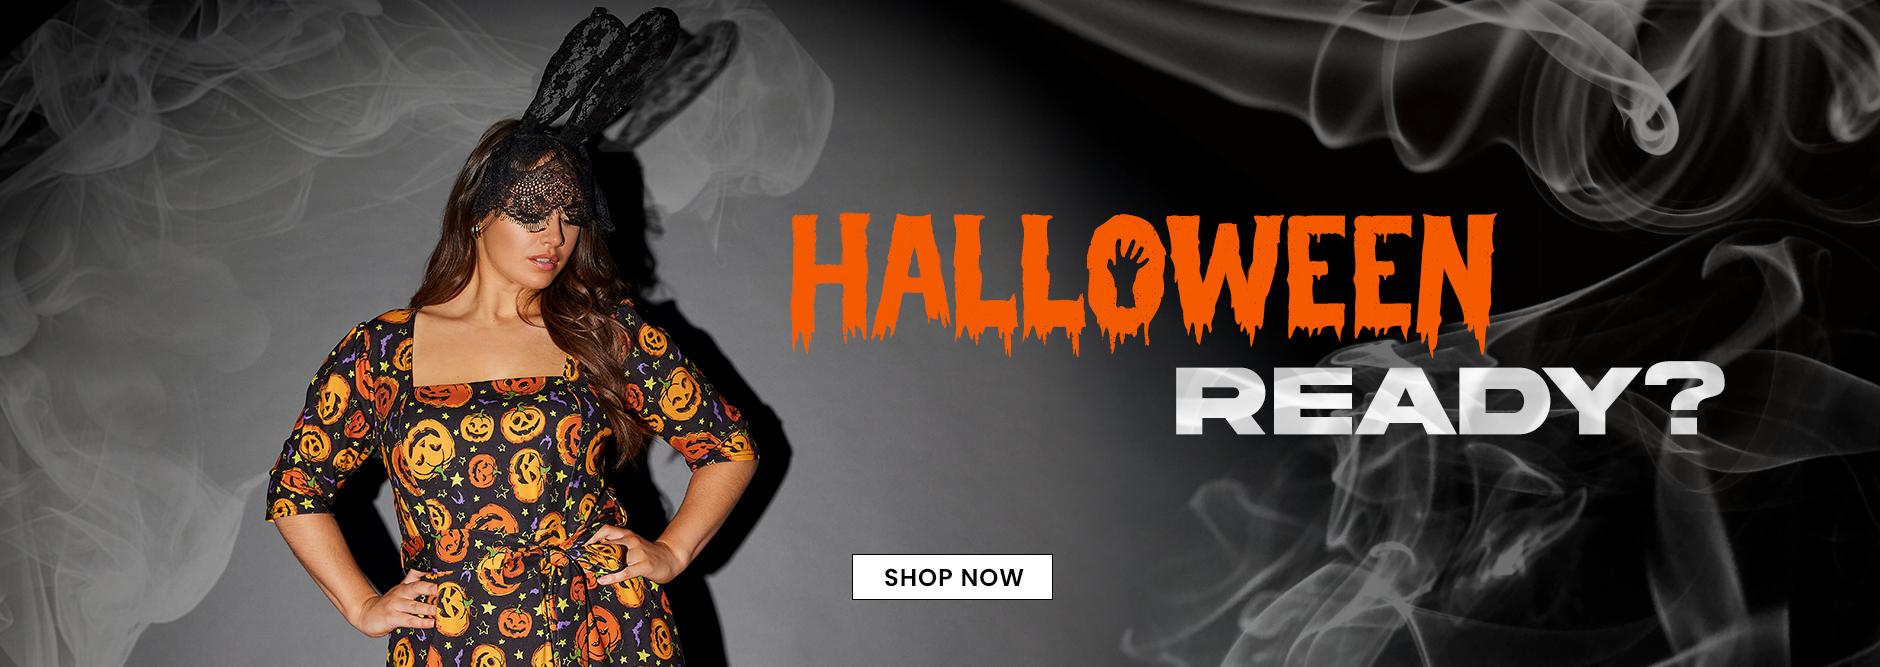 Plus Size Halloween ready?